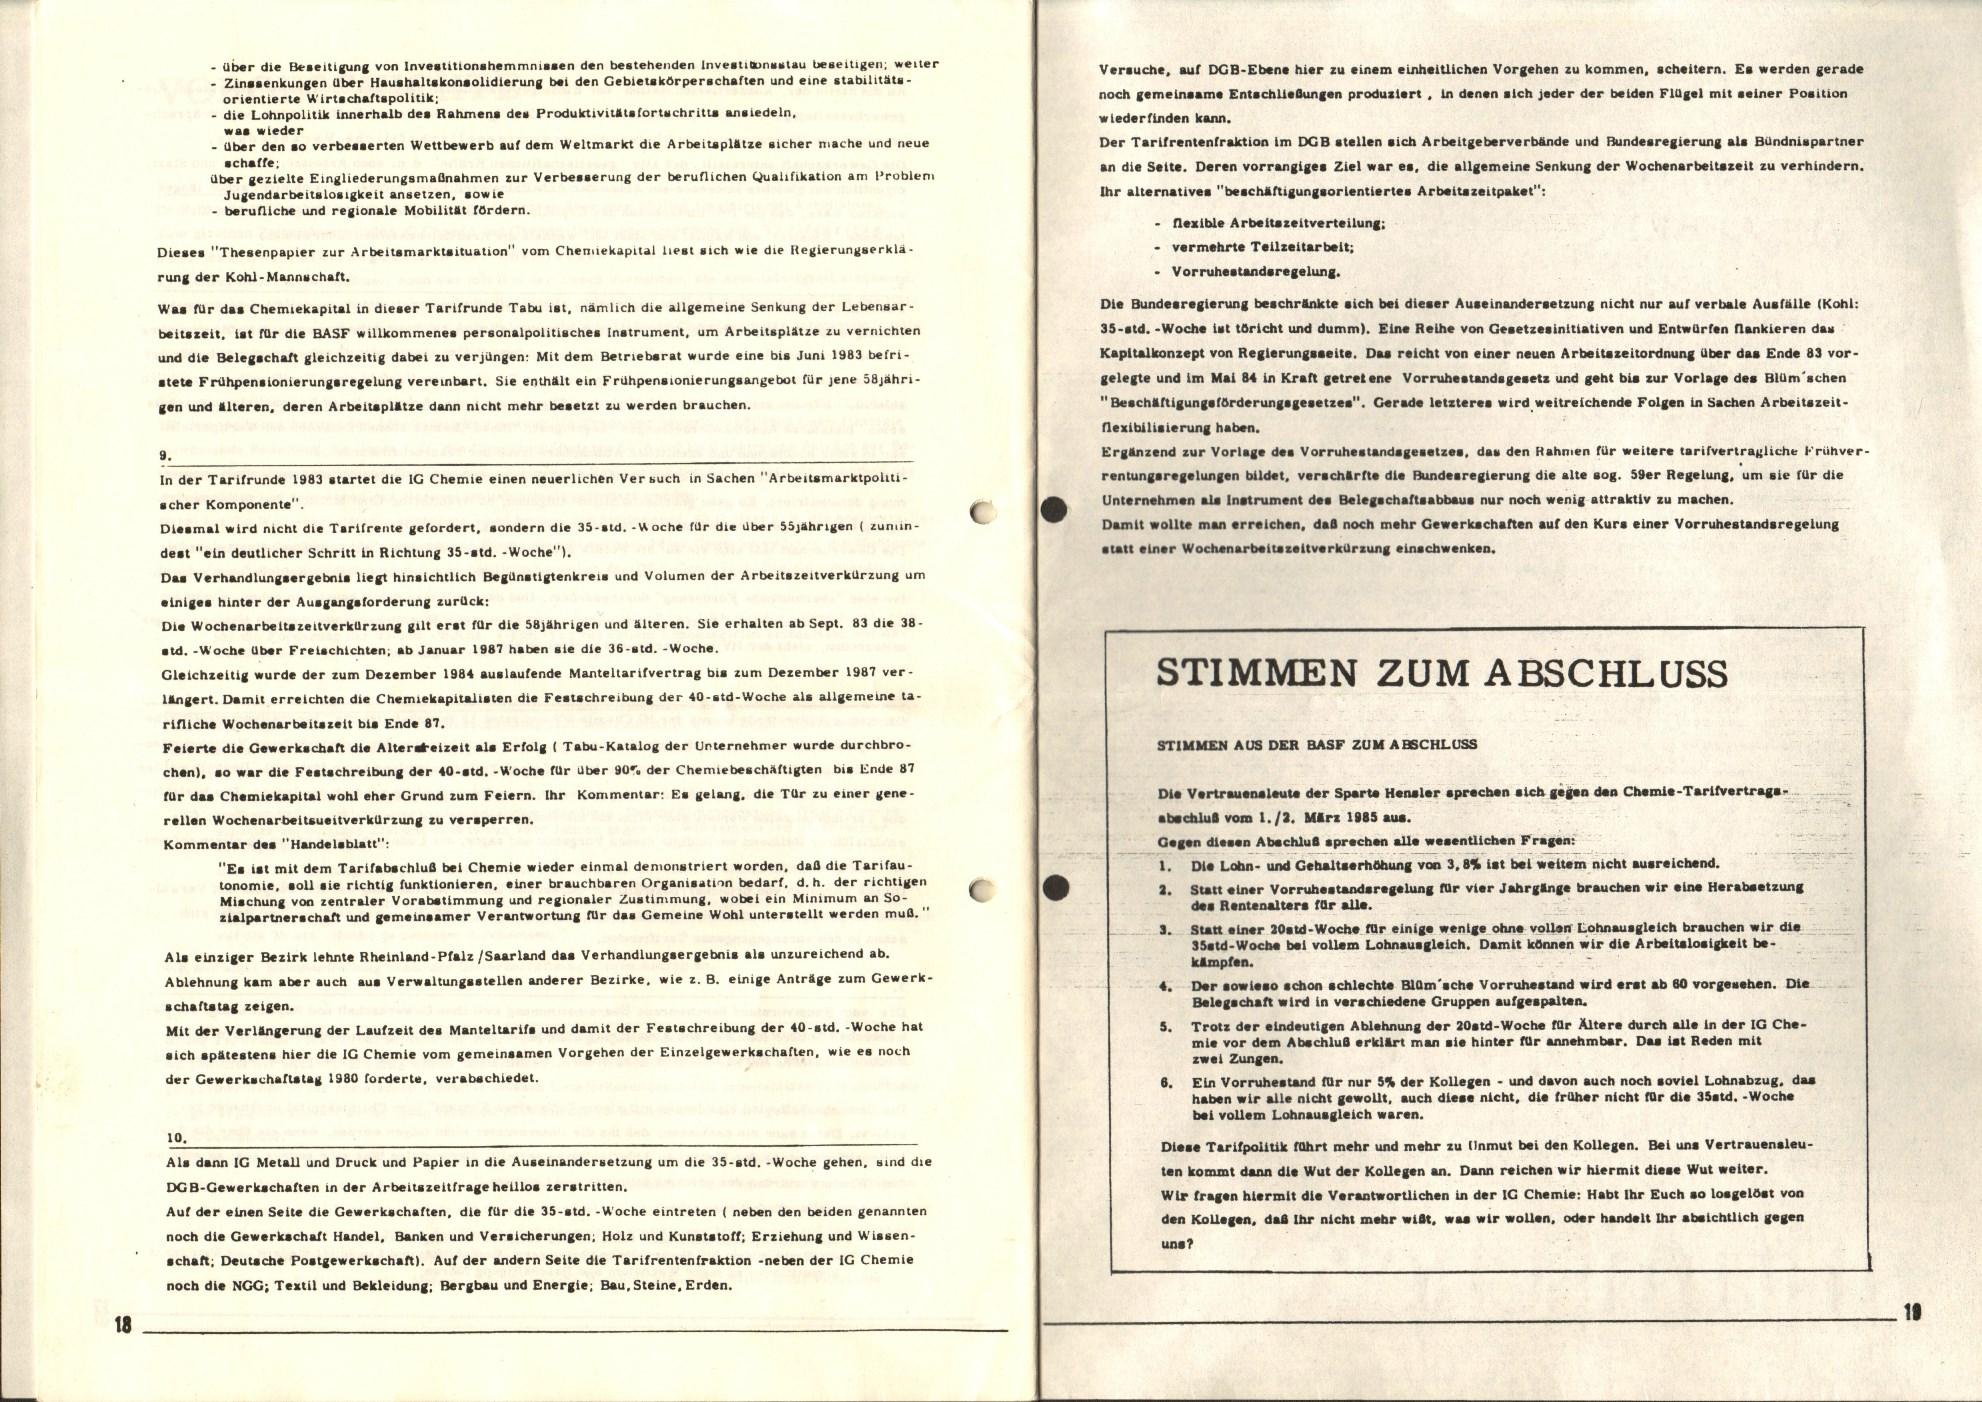 Ludwigshafen_BASF_Chemie_Tarifrunde_1985_10